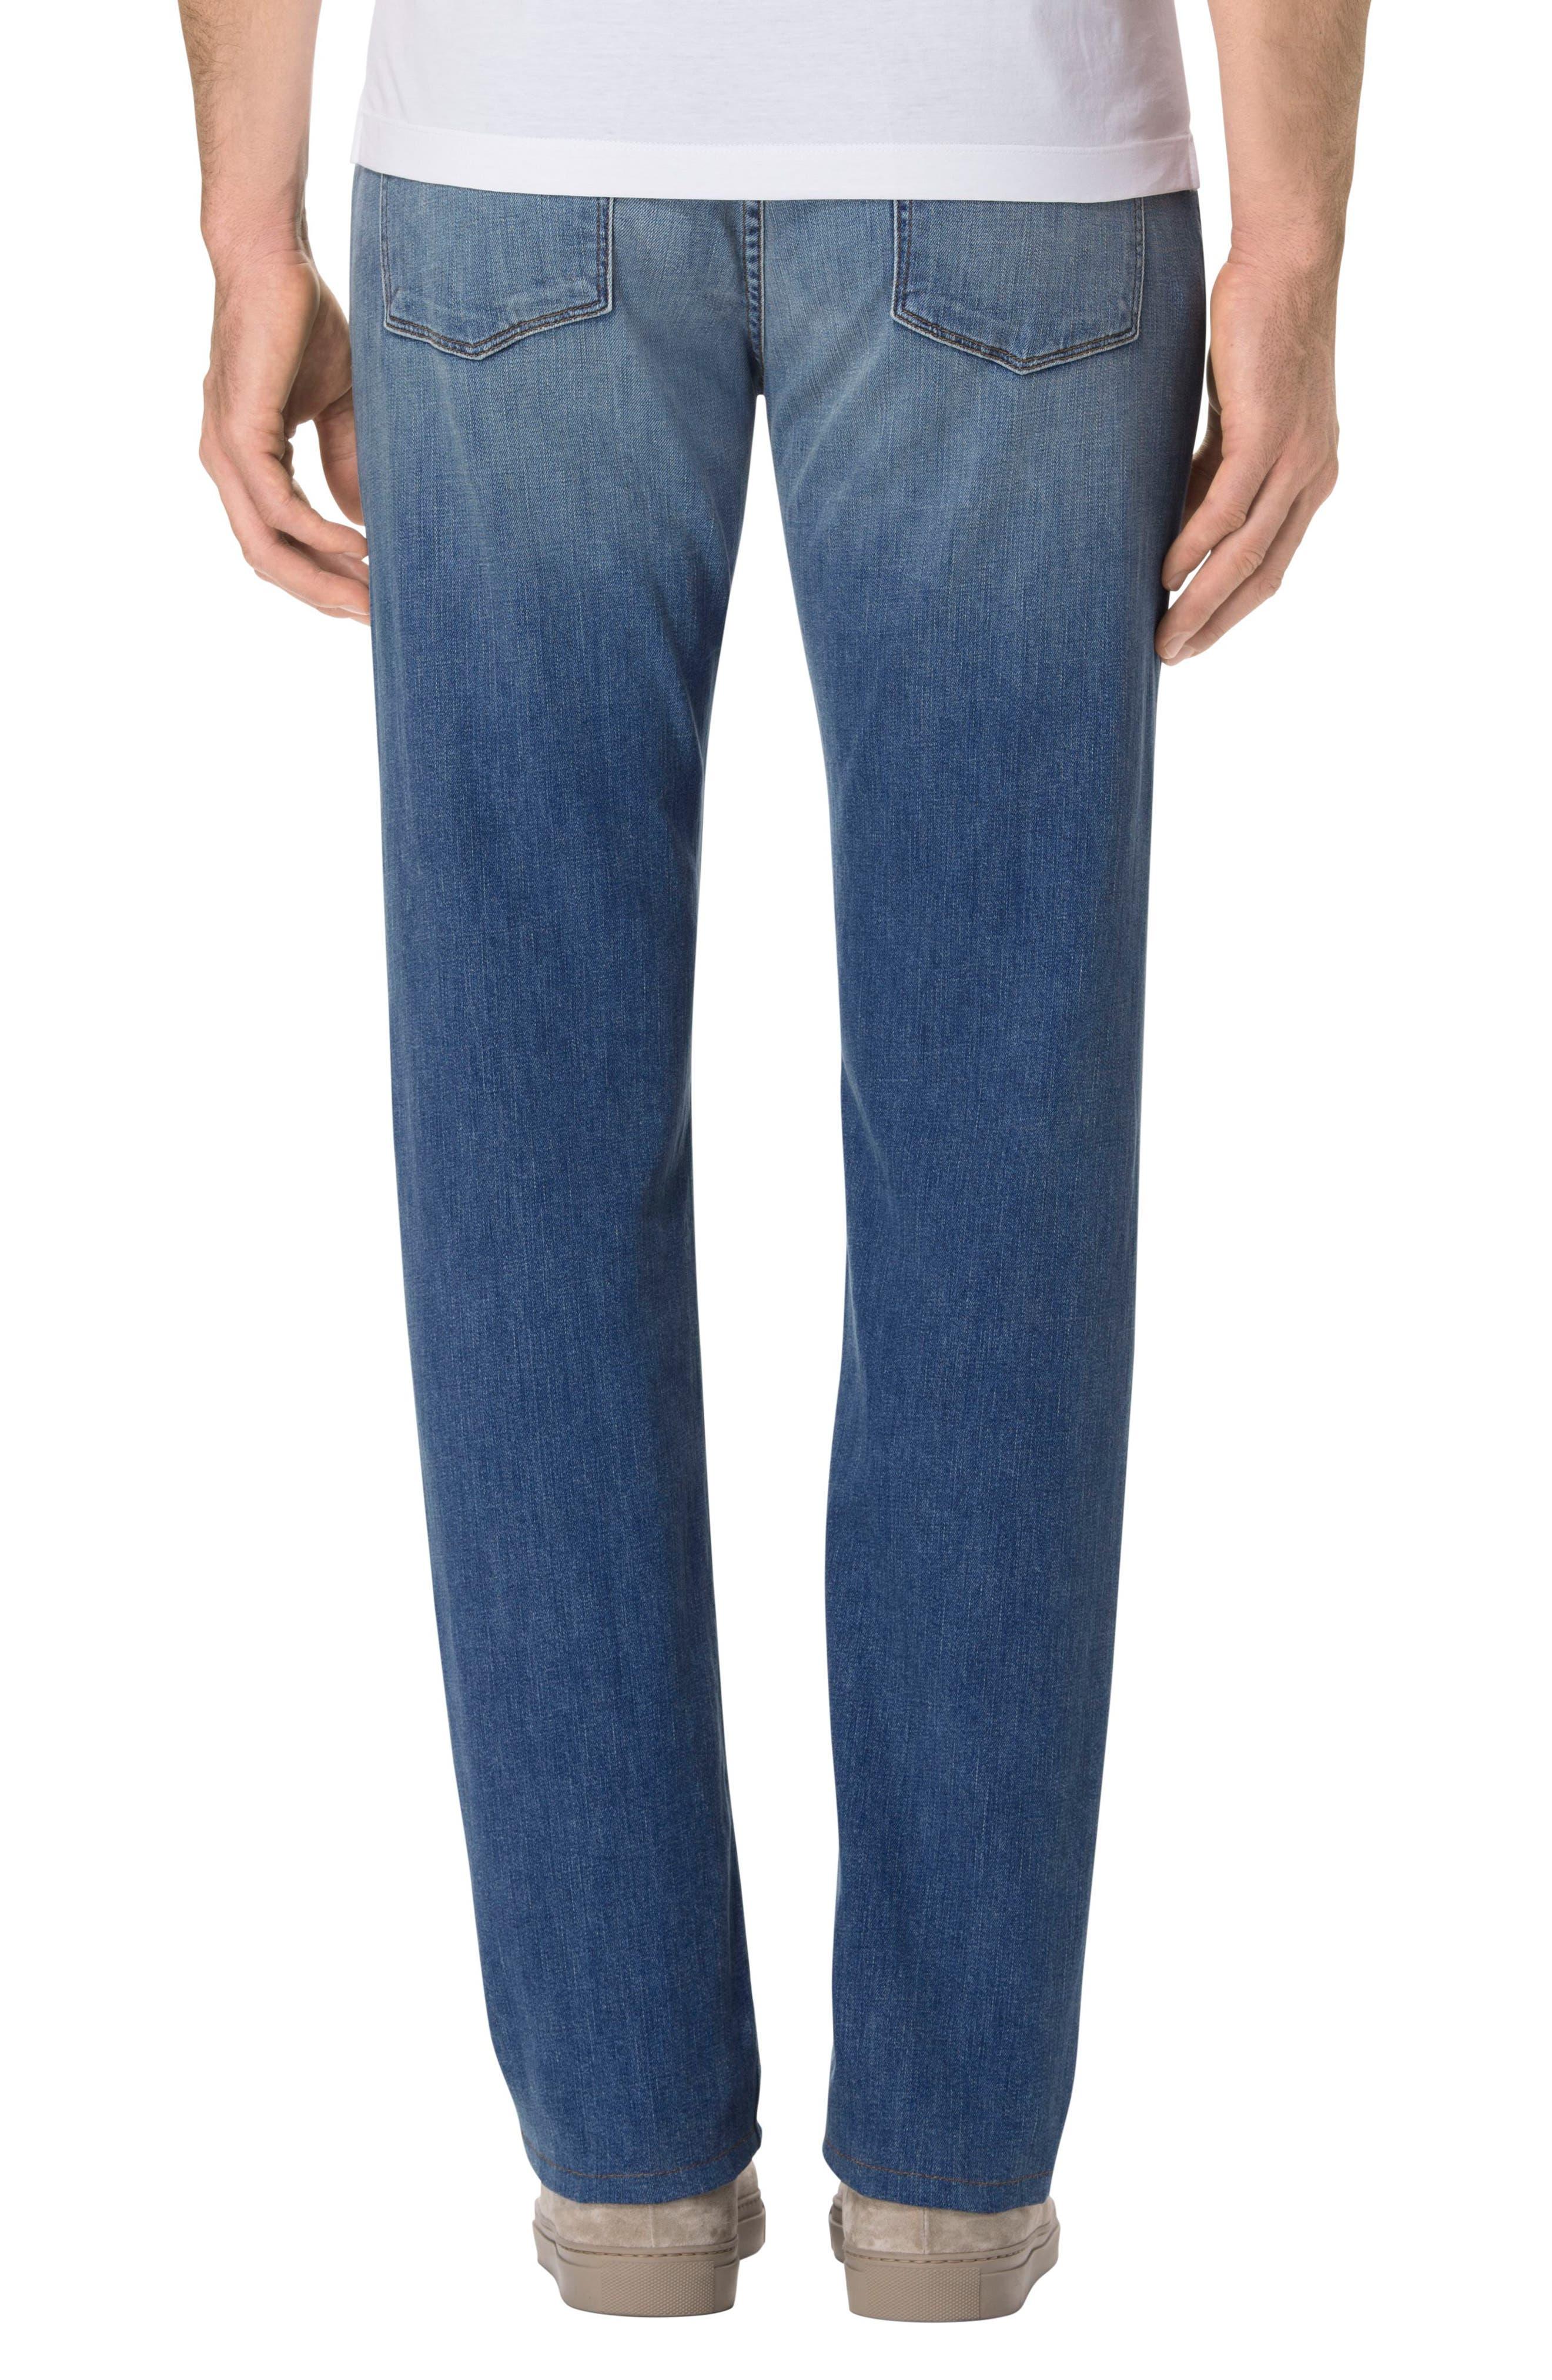 Kane Slim Straight Fit Jeans,                             Alternate thumbnail 2, color,                             452